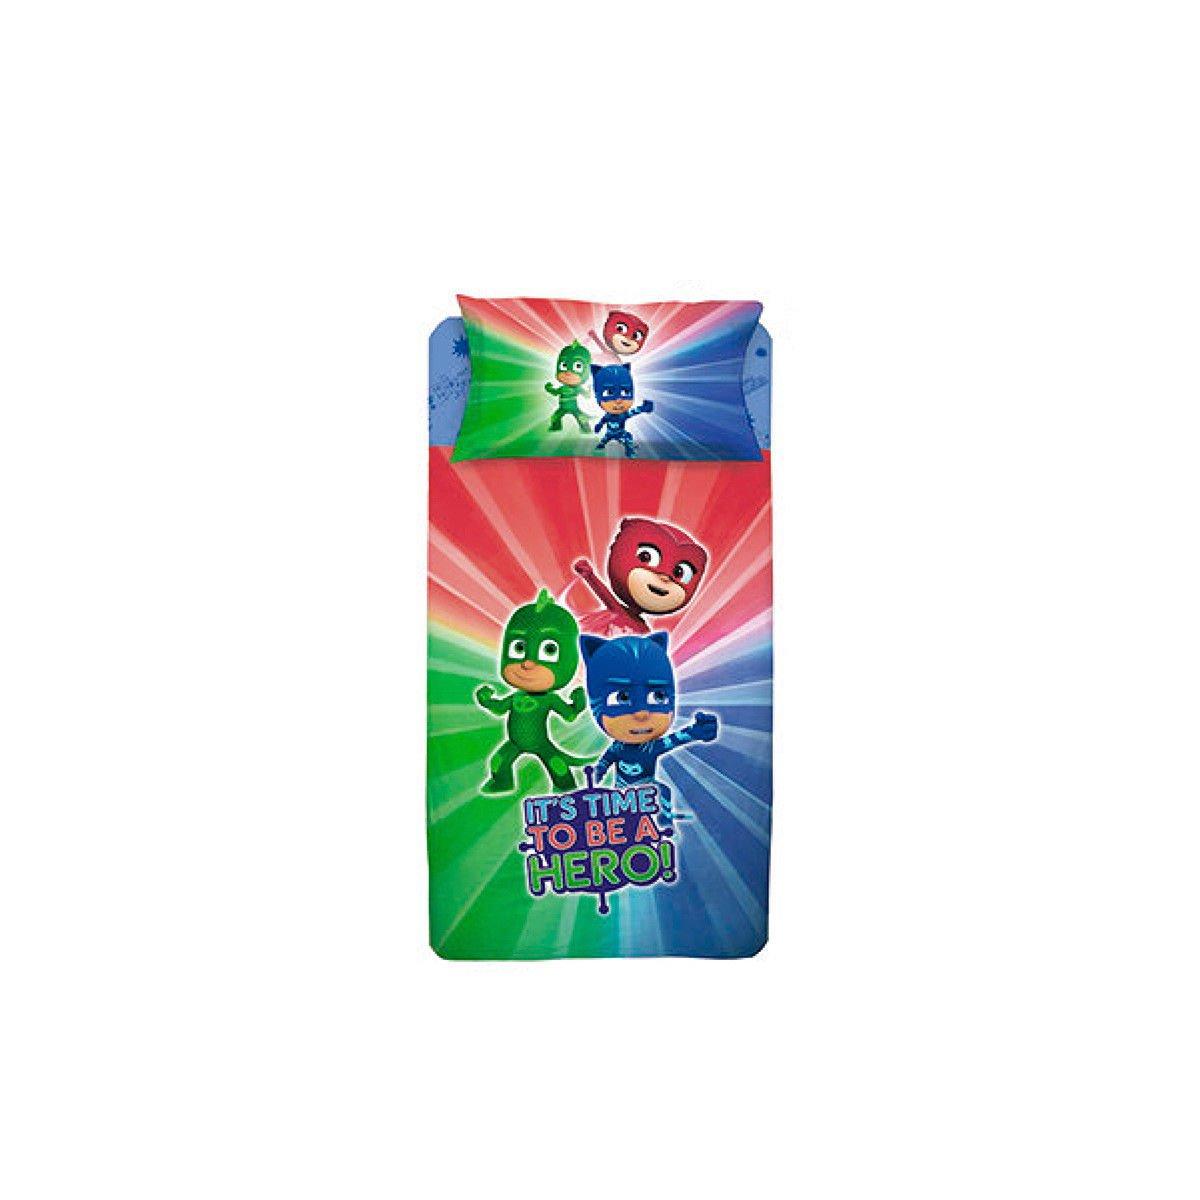 Completo sábanas Super pigiamini PJ MASKS para cama individual Una Plaza R290: Amazon.es: Hogar